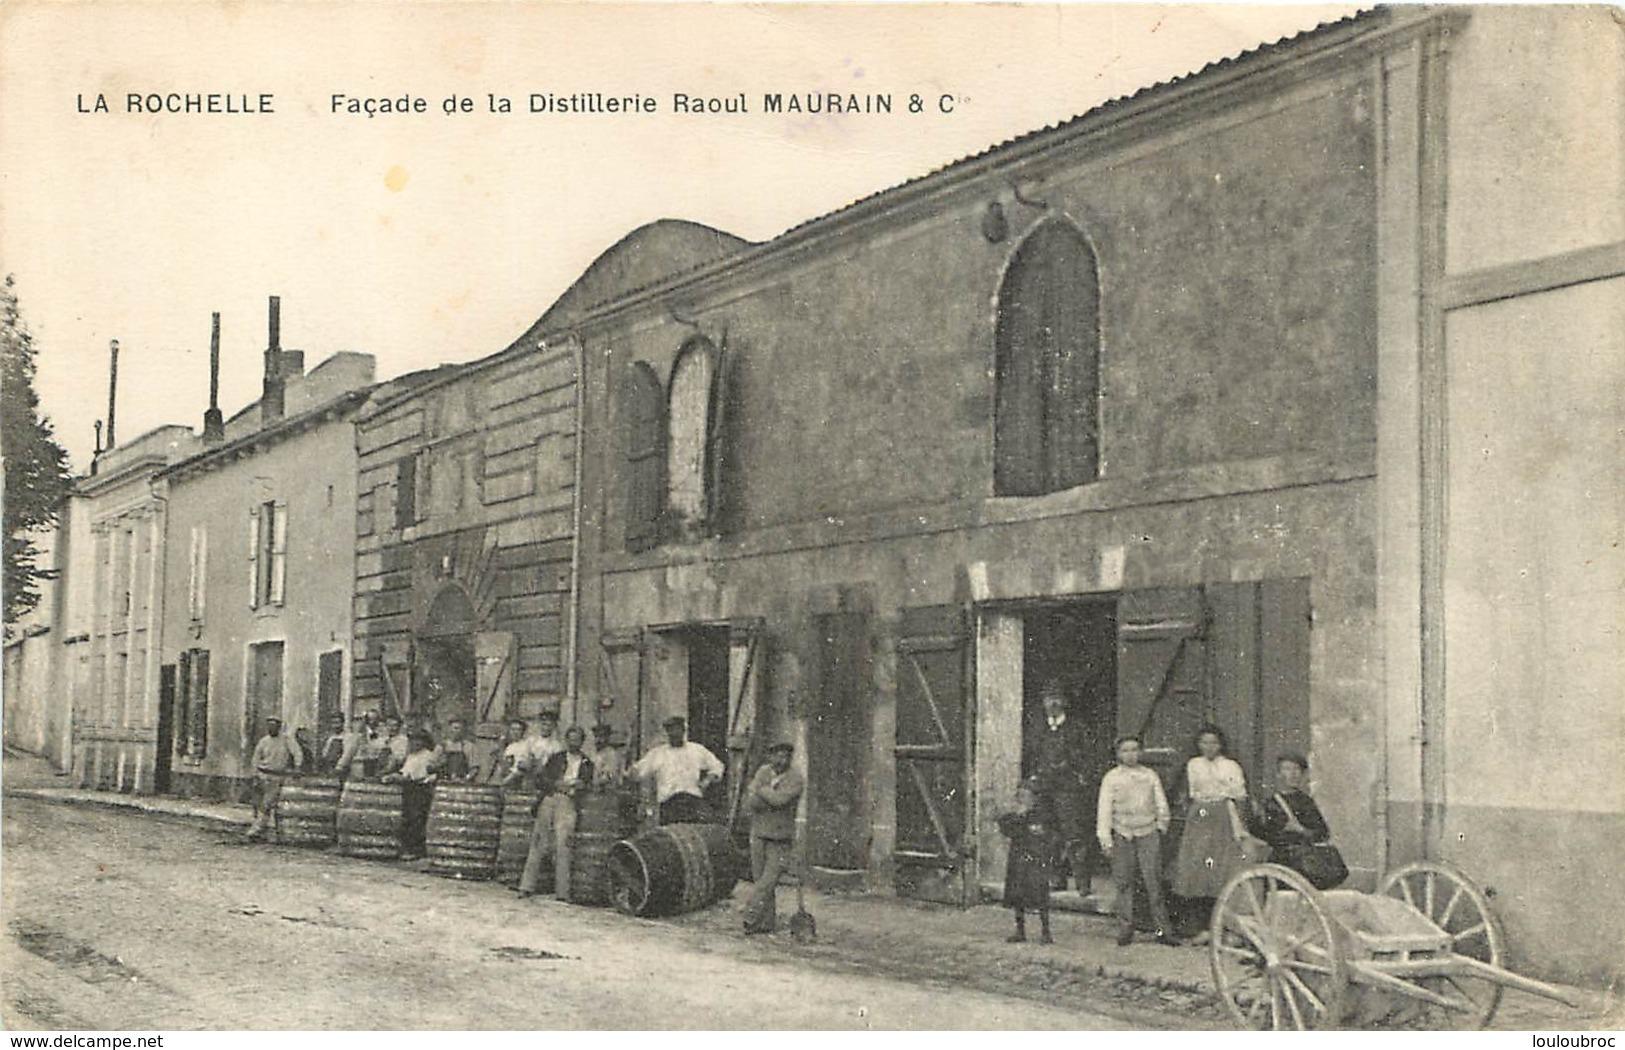 LA ROCHELLE FACADE DE LA DISTILLERIE RAOUL MAURAIN - La Rochelle